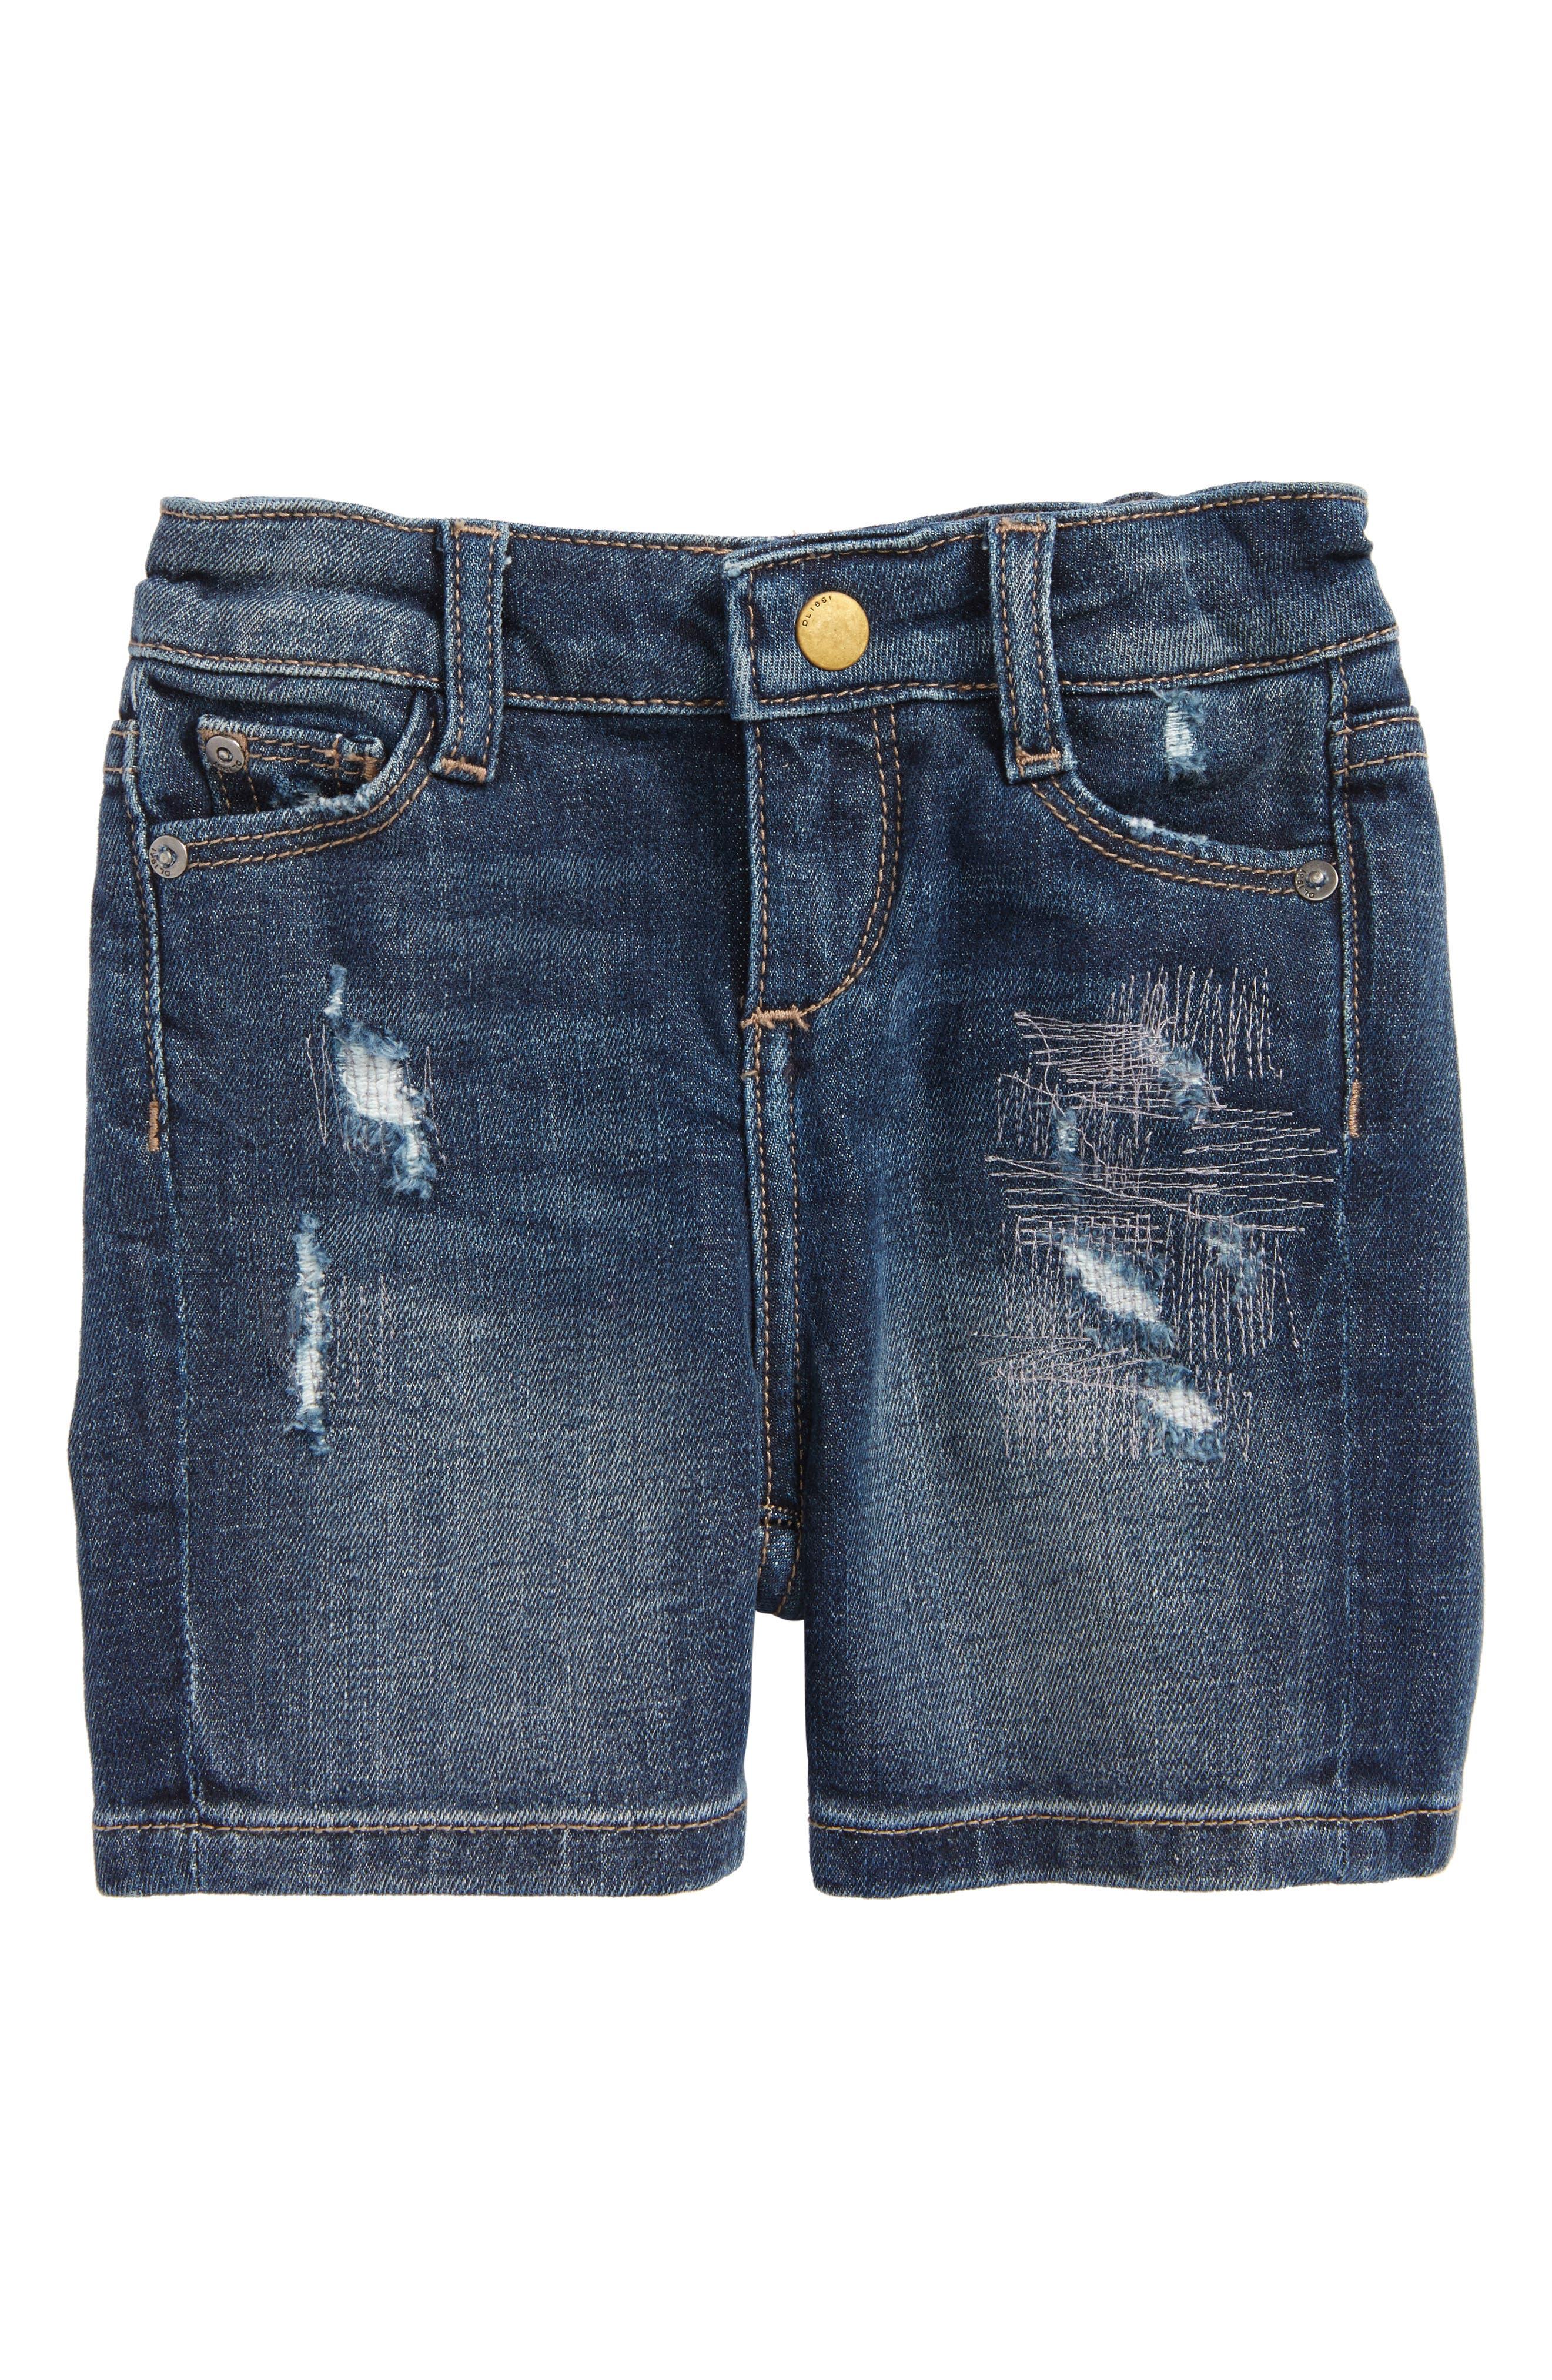 DL1961 Kaley Denim Shorts, Main, color, 405